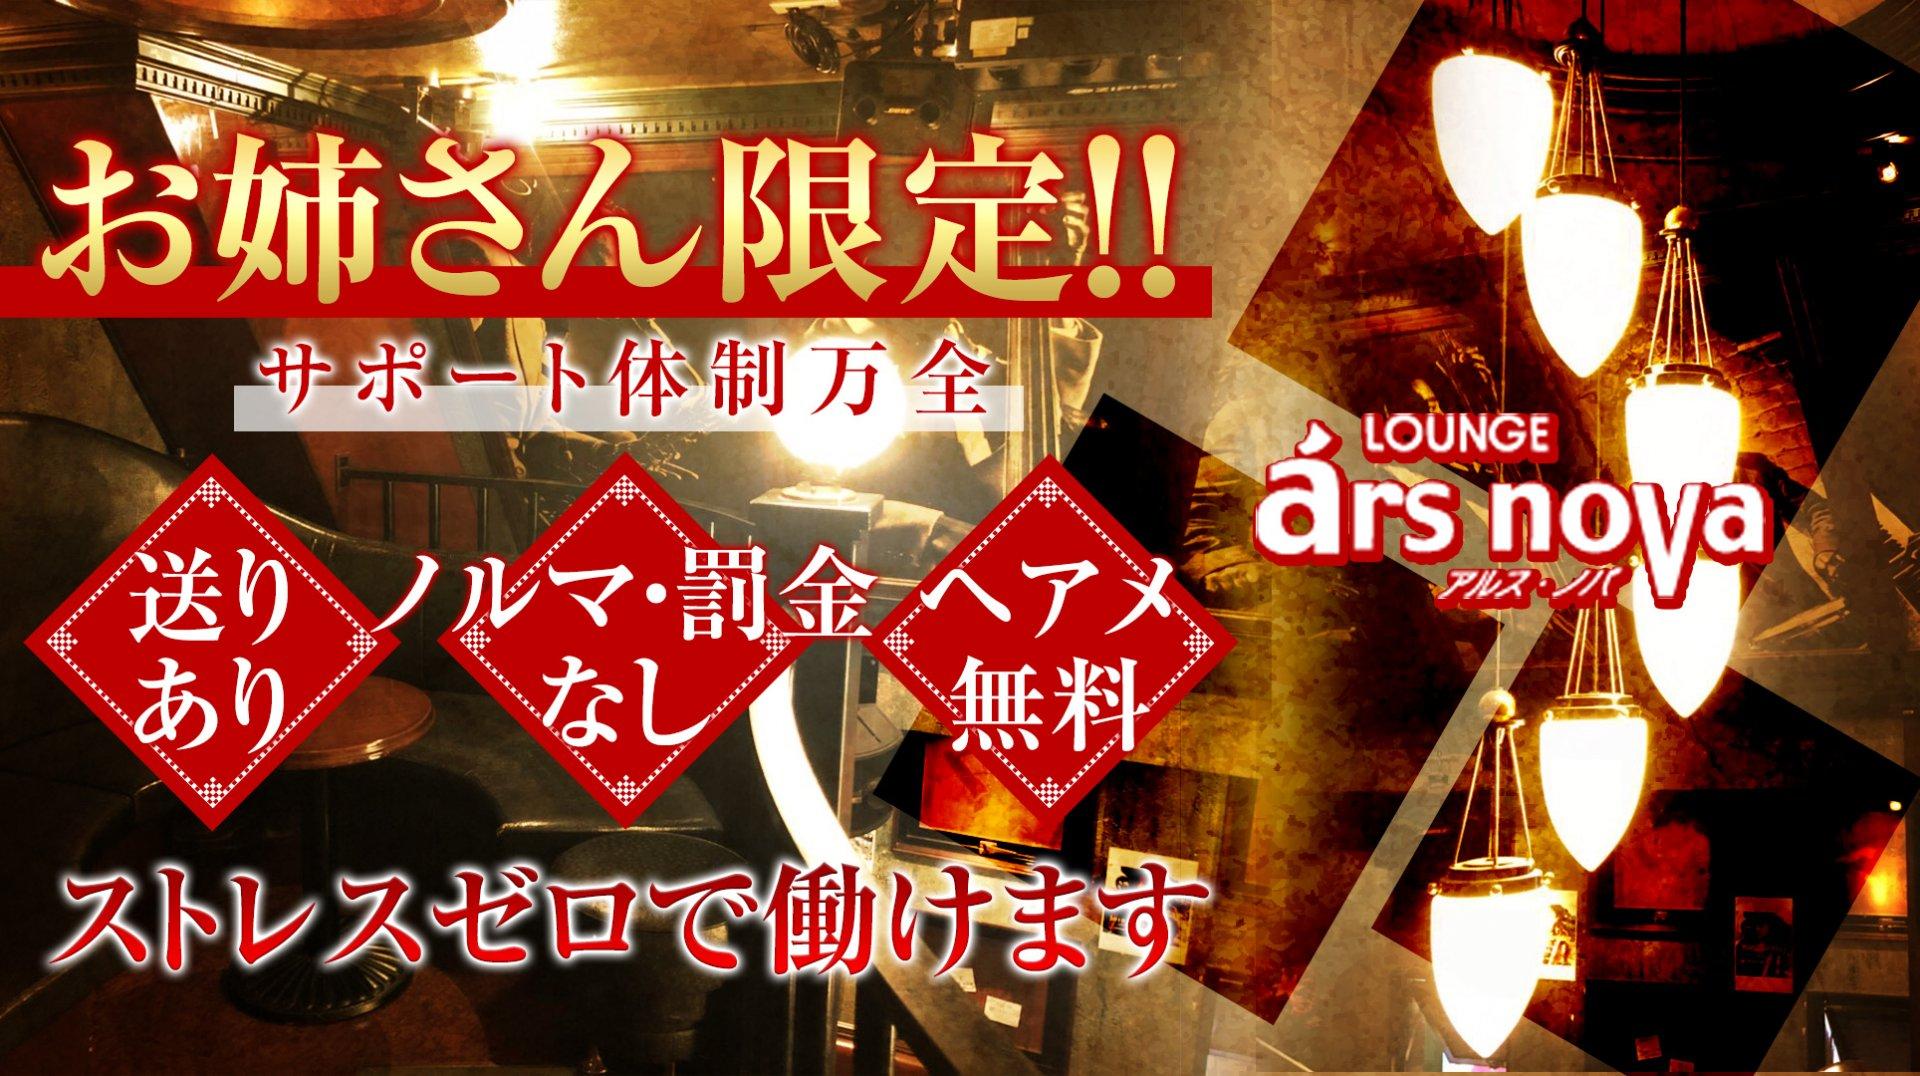 LOUNGE ars nova[アルス・ノバ] 中野 キャバクラ TOP画像